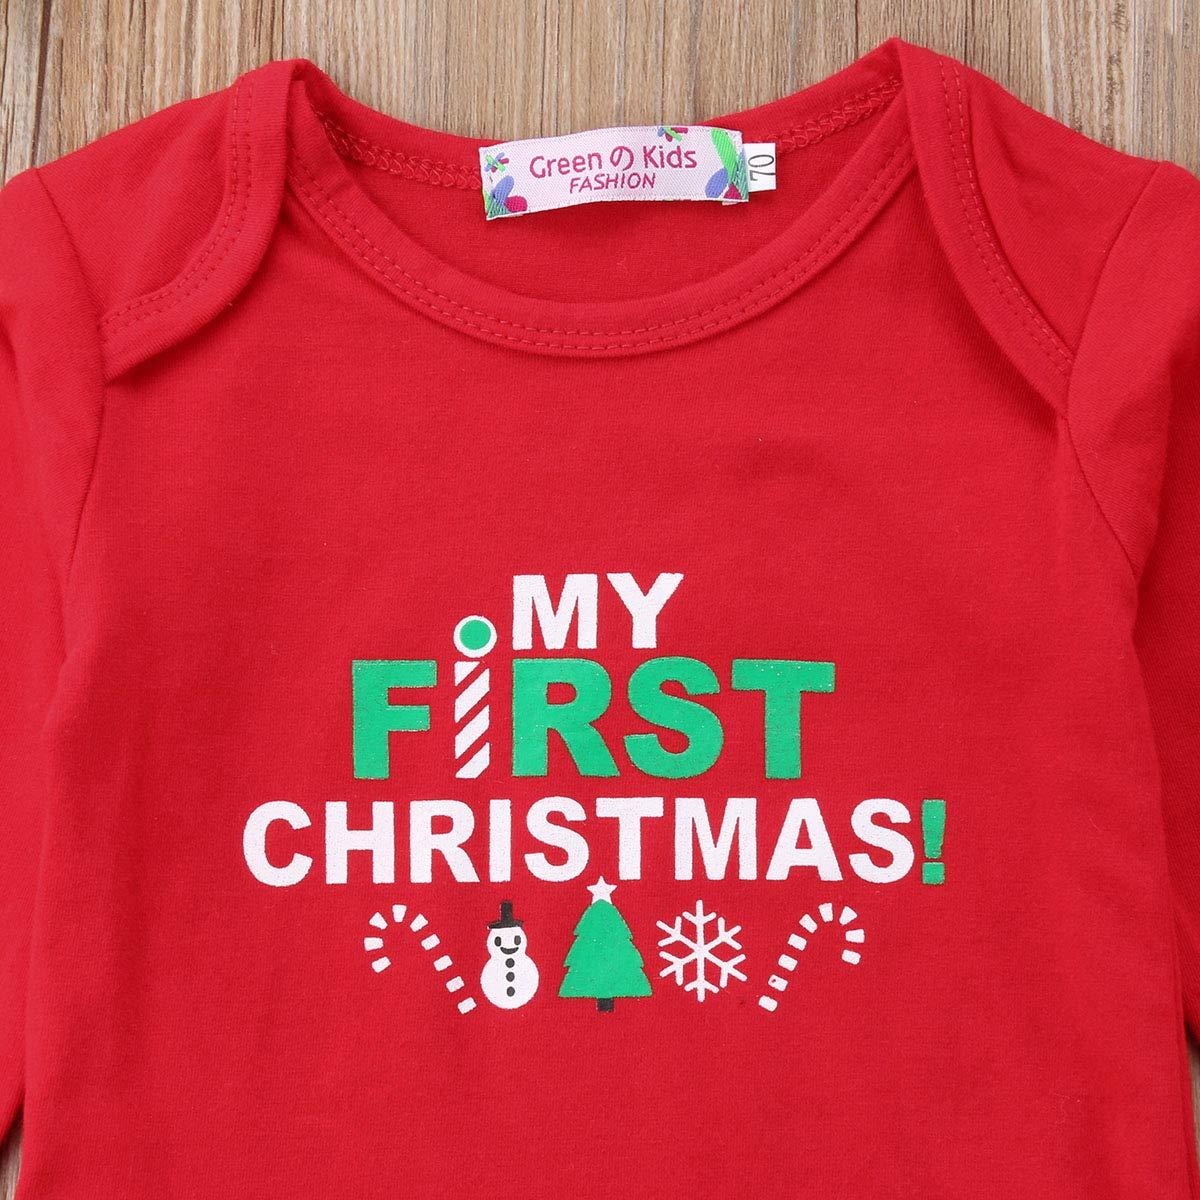 975d2131a98 ... My First Christmas Outfit Toddler Newborn Baby Girls Xmas Romper+Bowknot  Santa Skirt+Headband ...